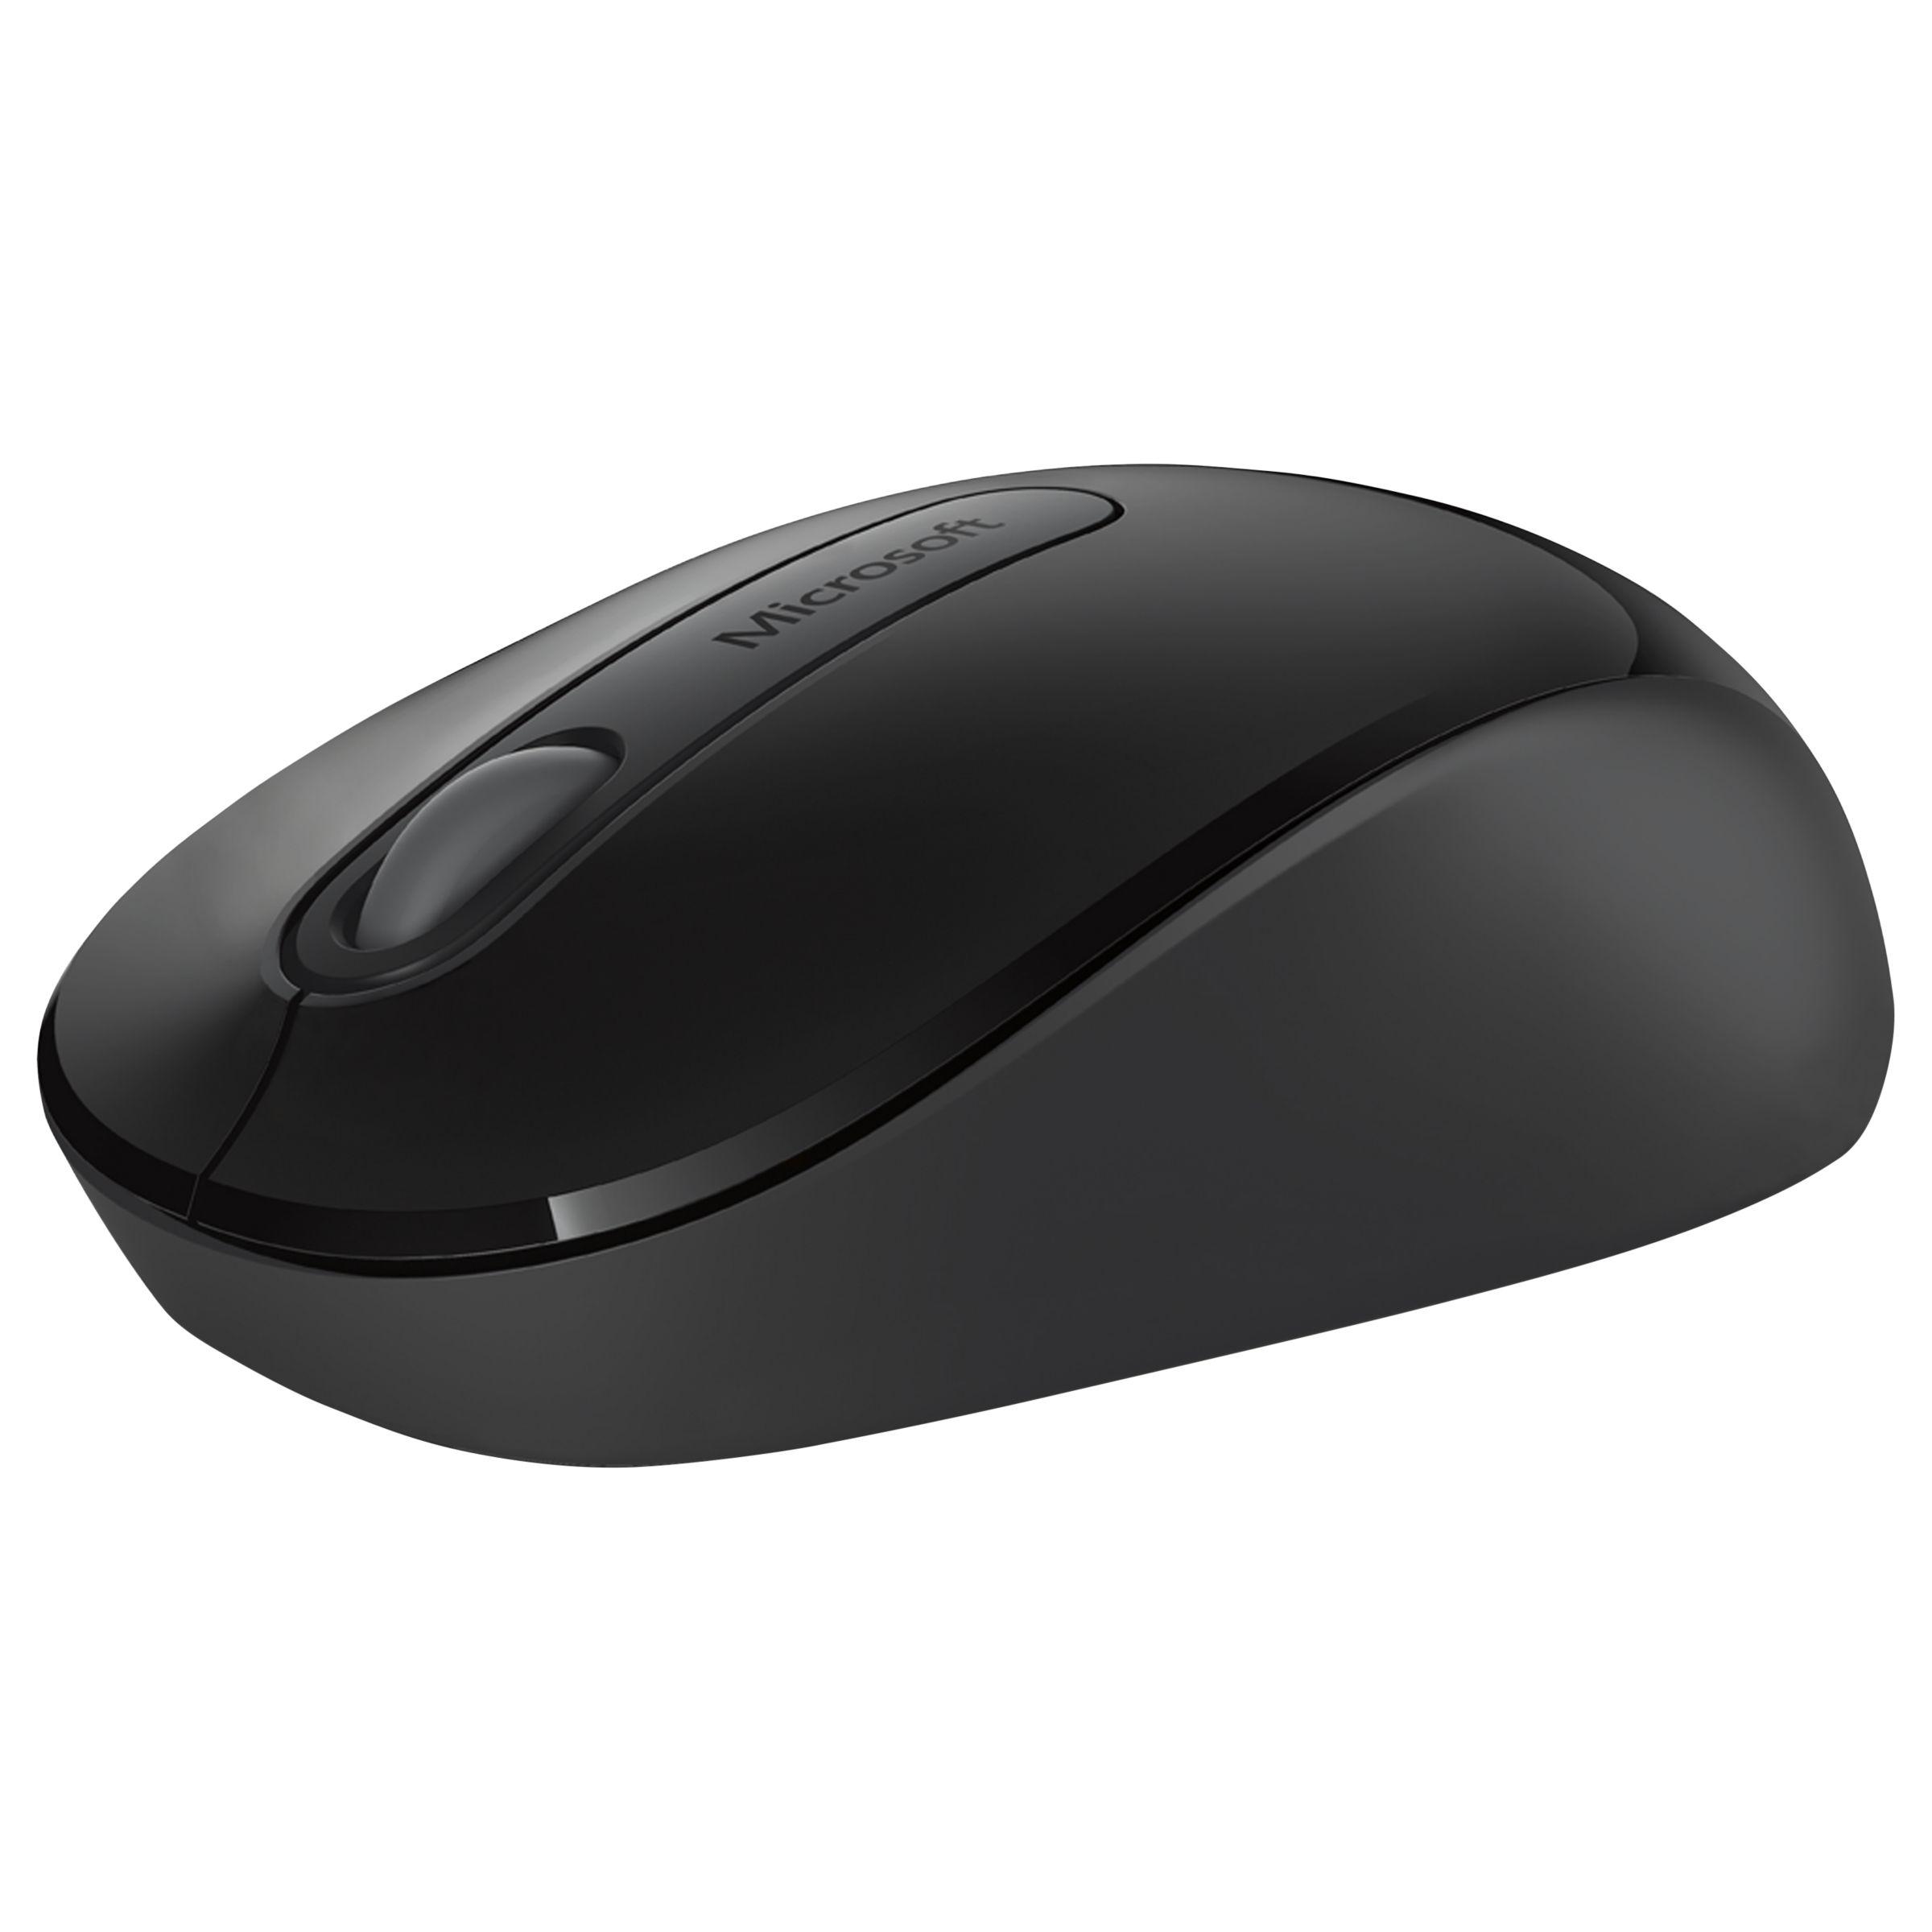 Microsoft Microsoft 900 Wireless Mouse, Black